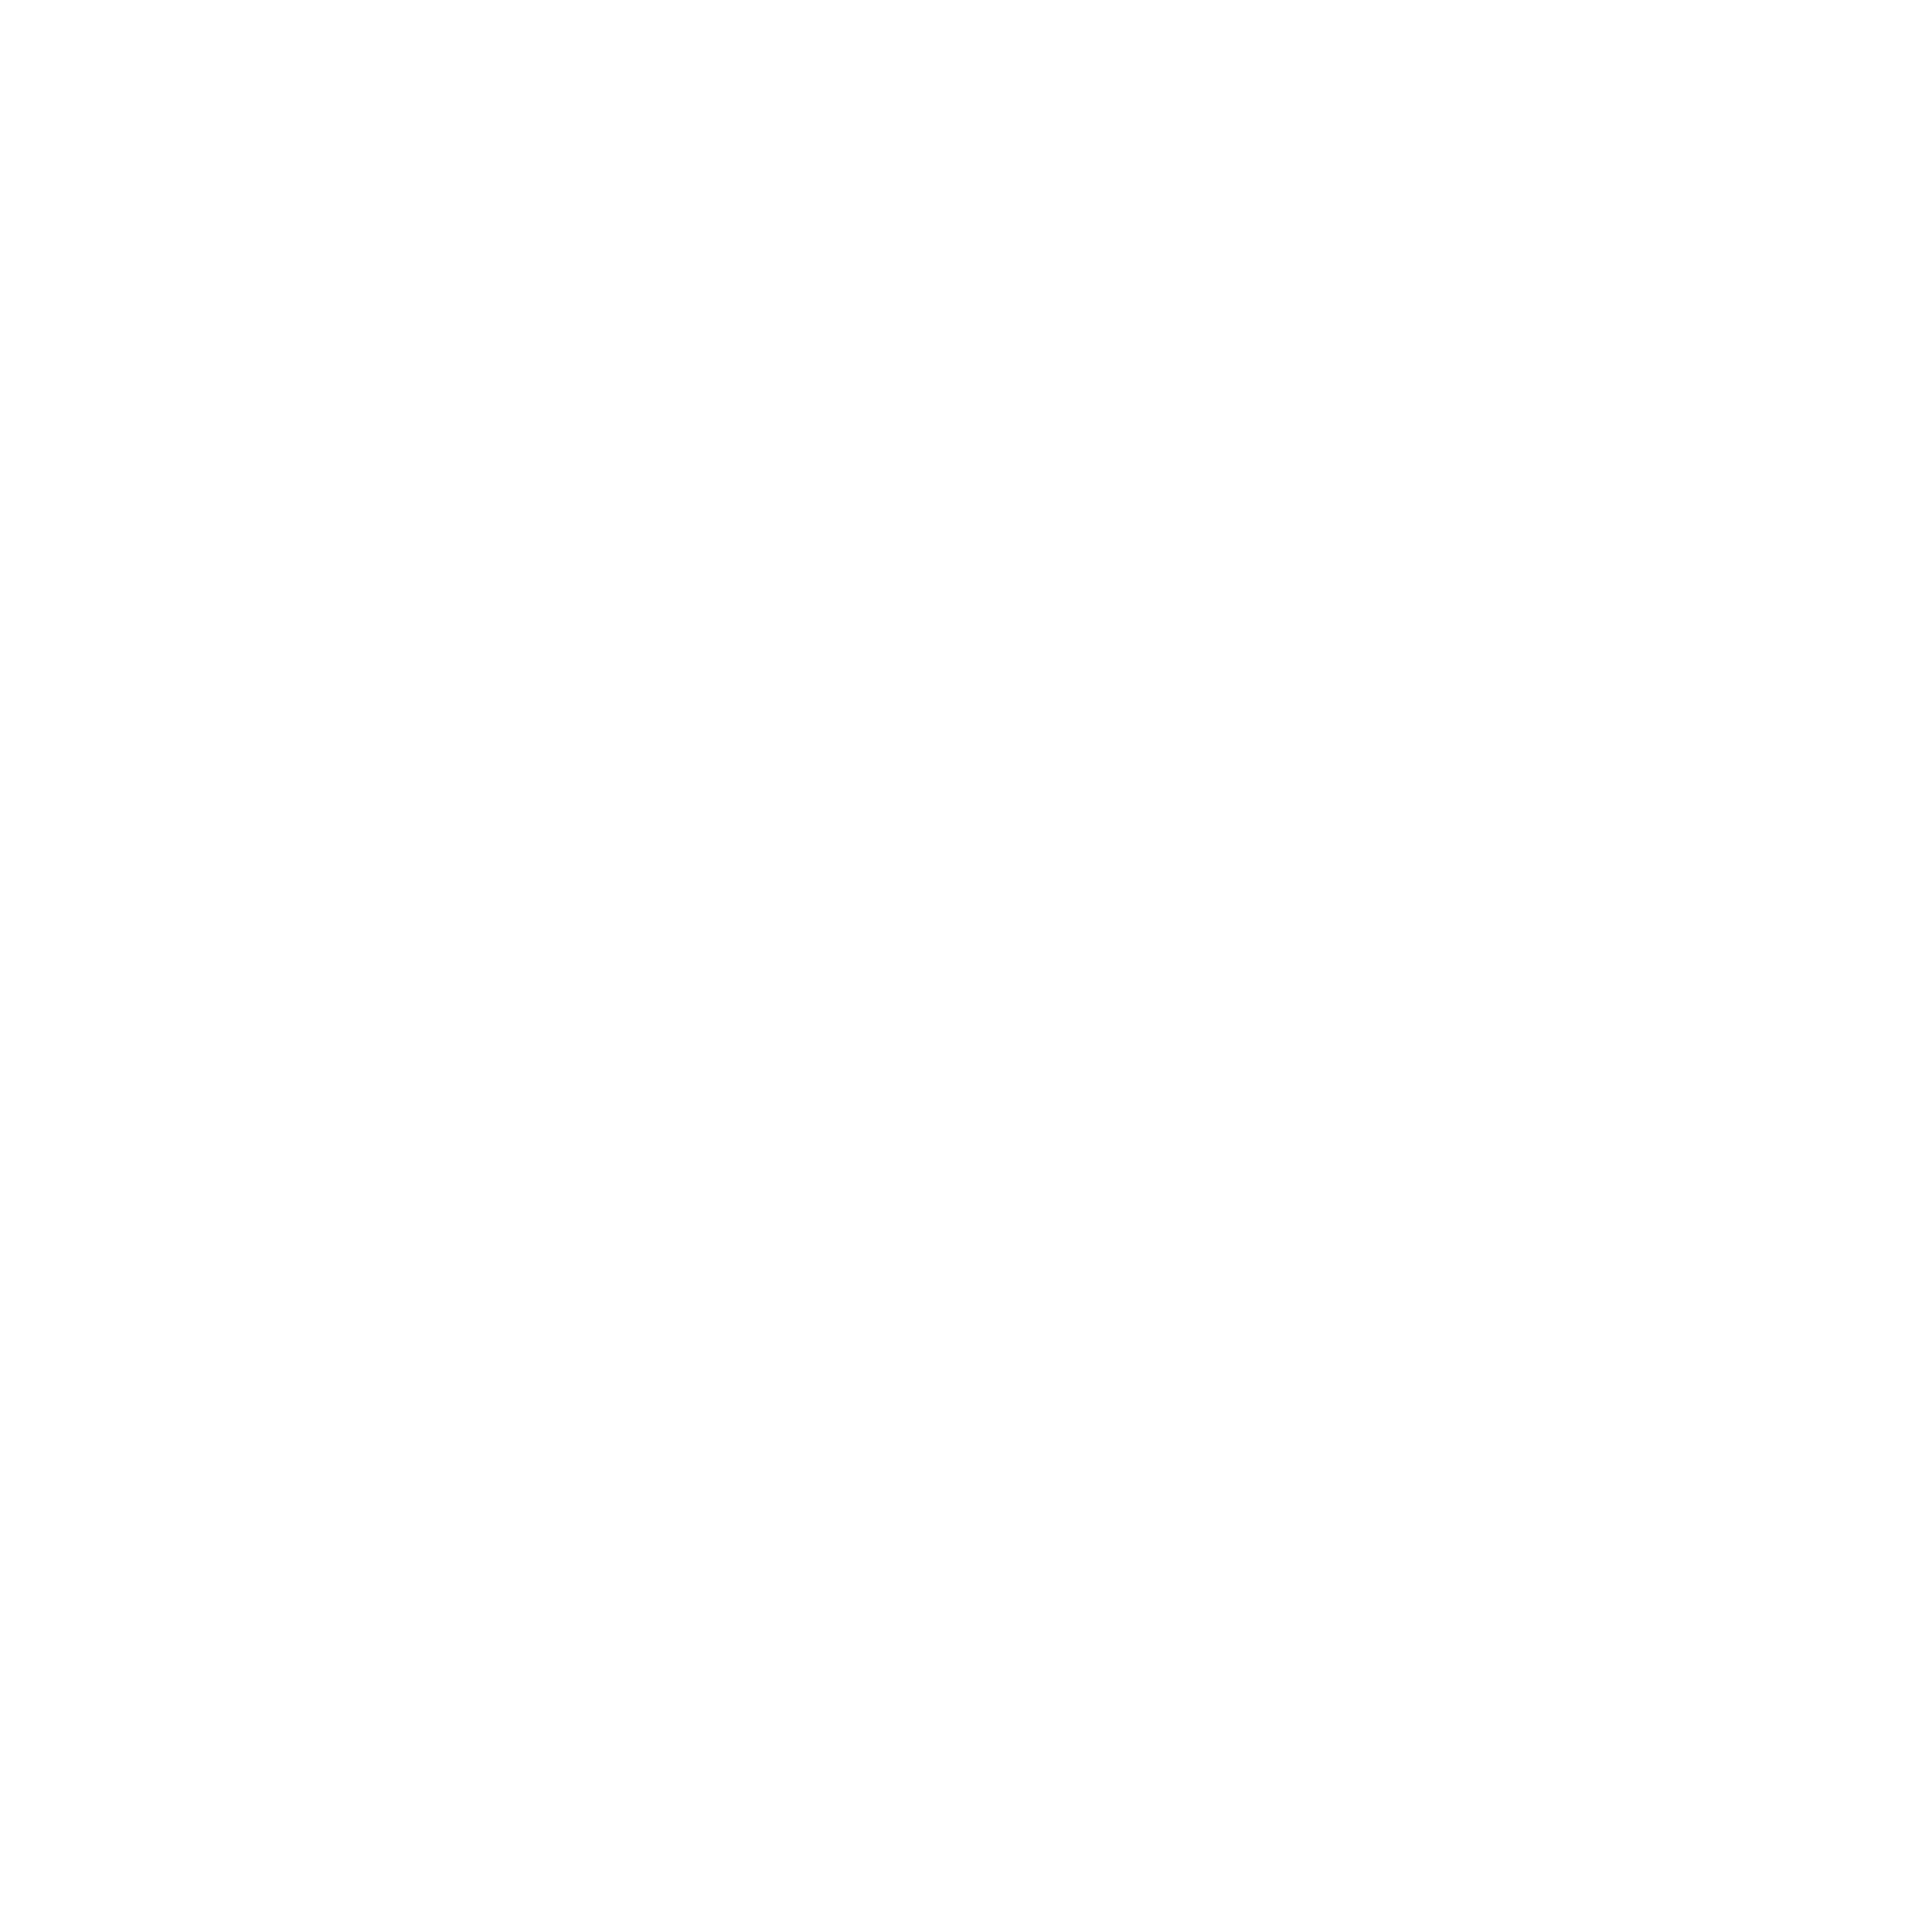 Futrli Integrity Partnership Digital Partner